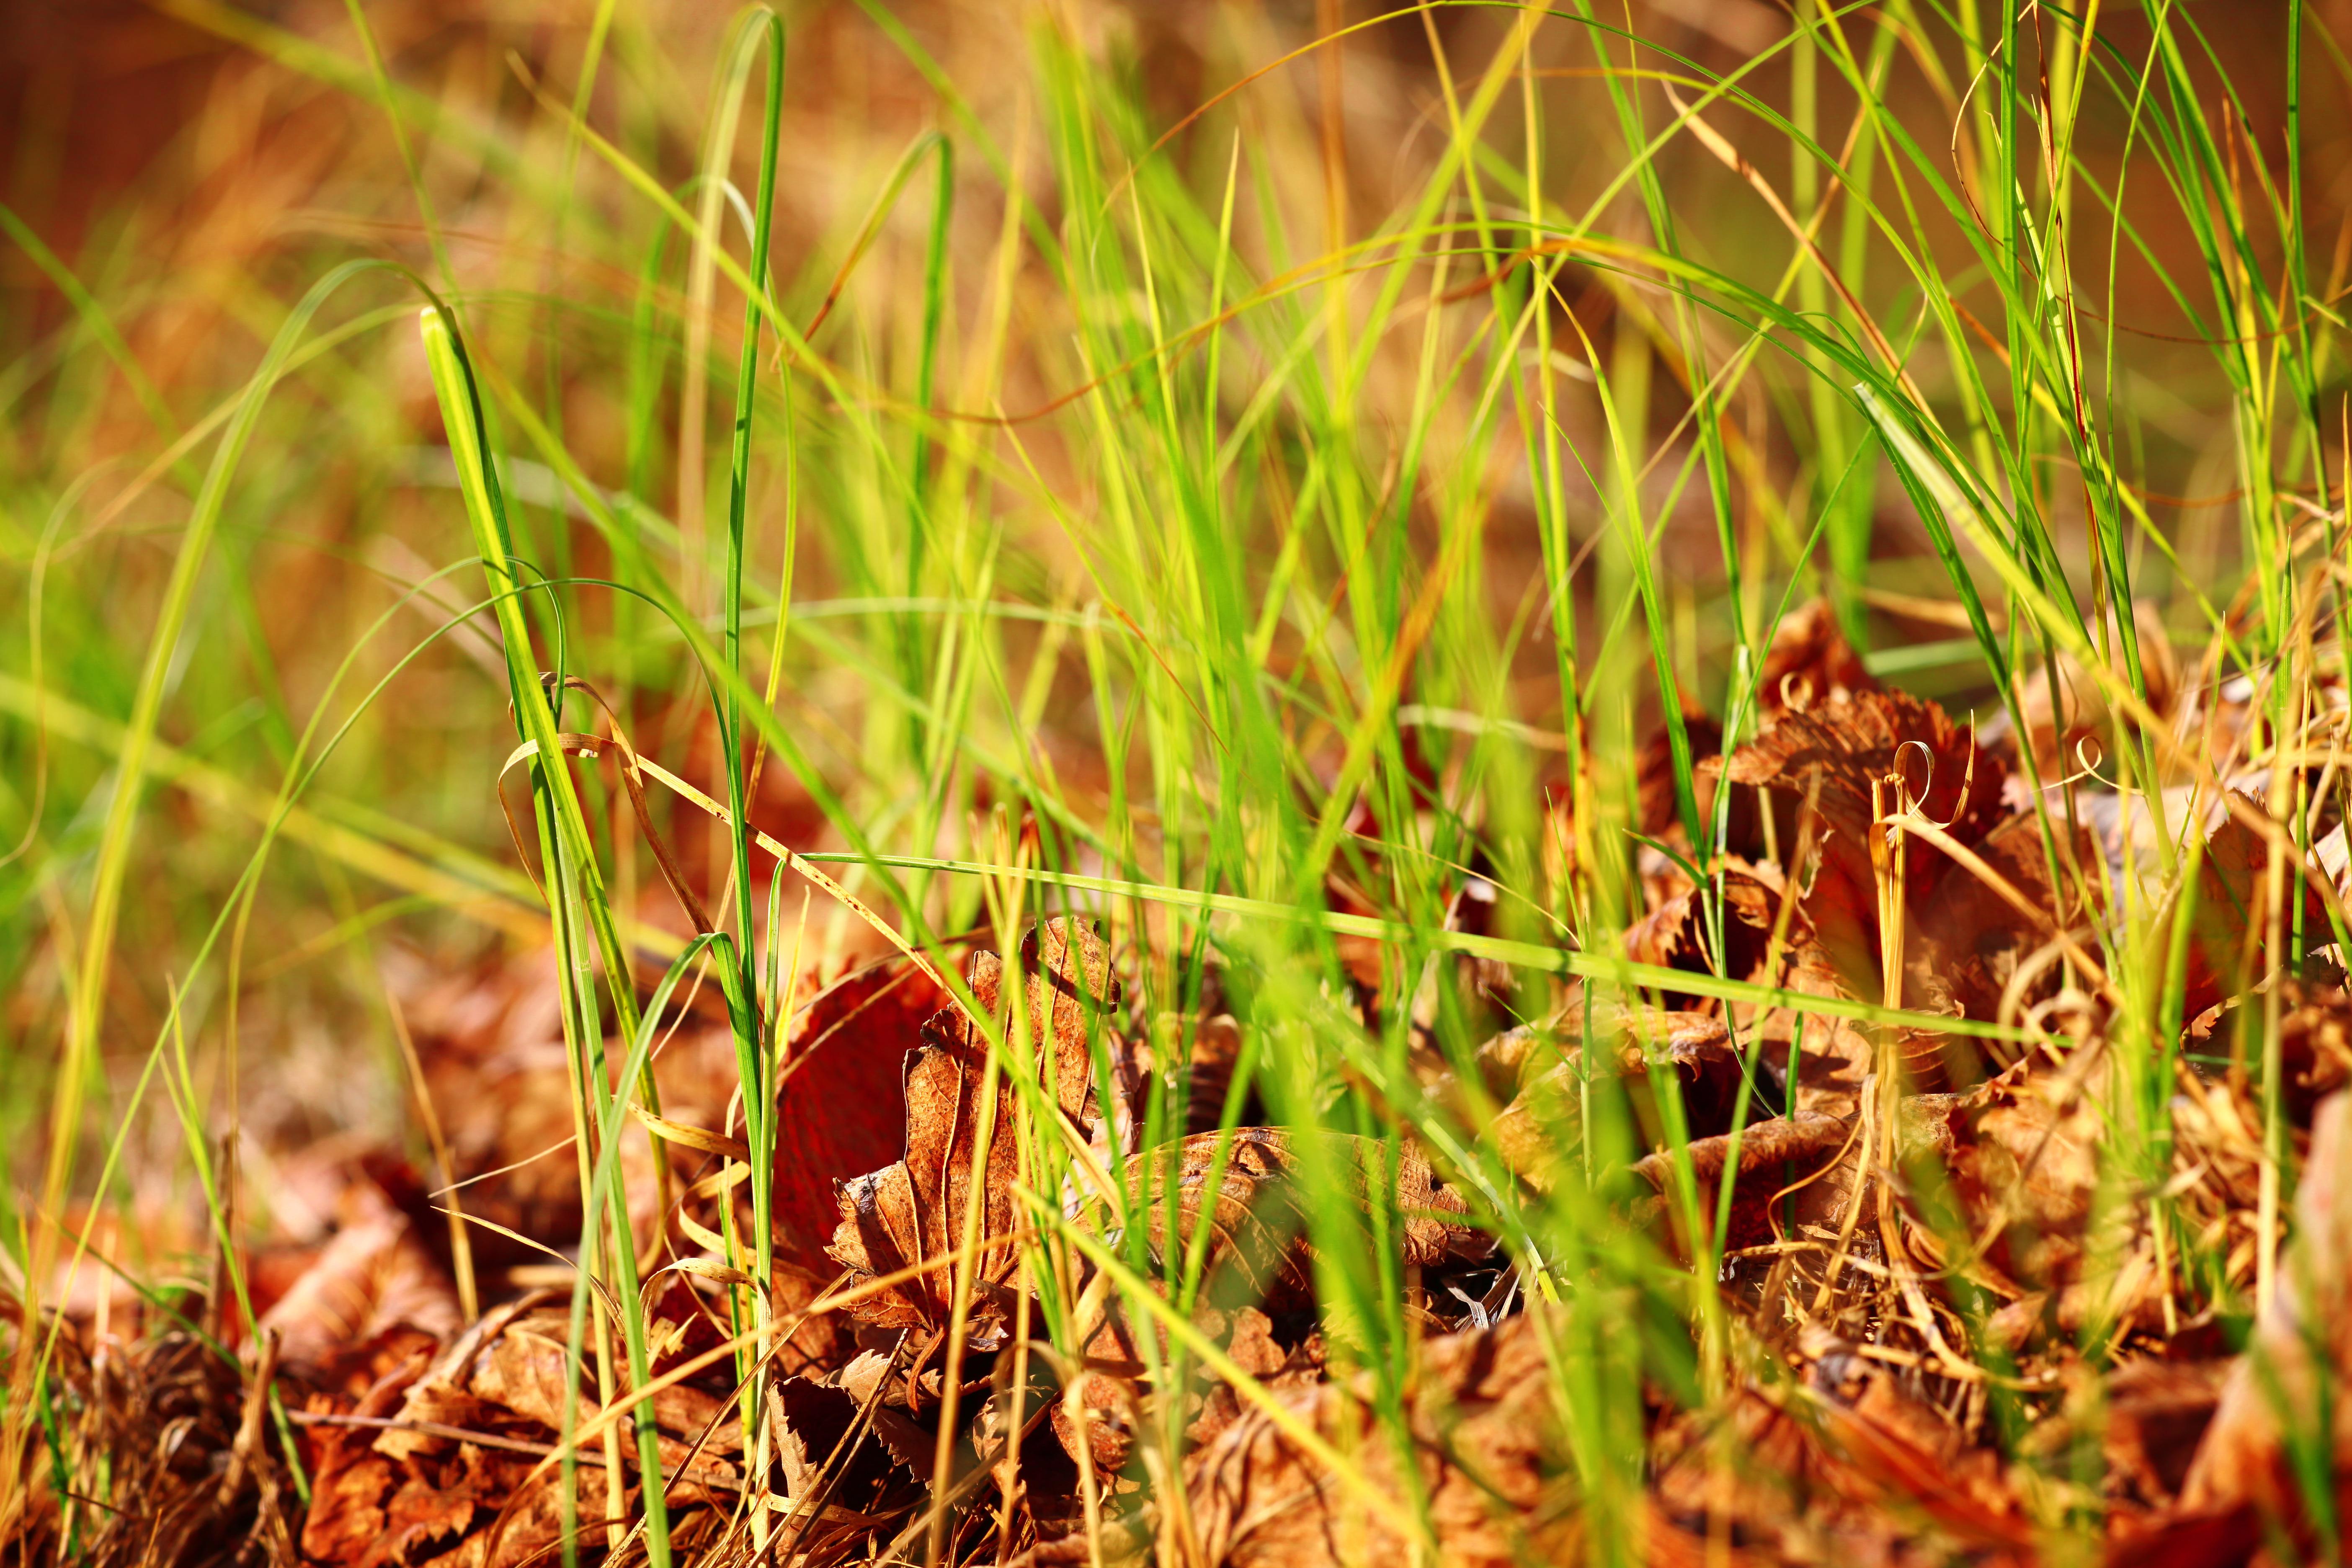 Grass, Green, Nature, Plants, HQ Photo